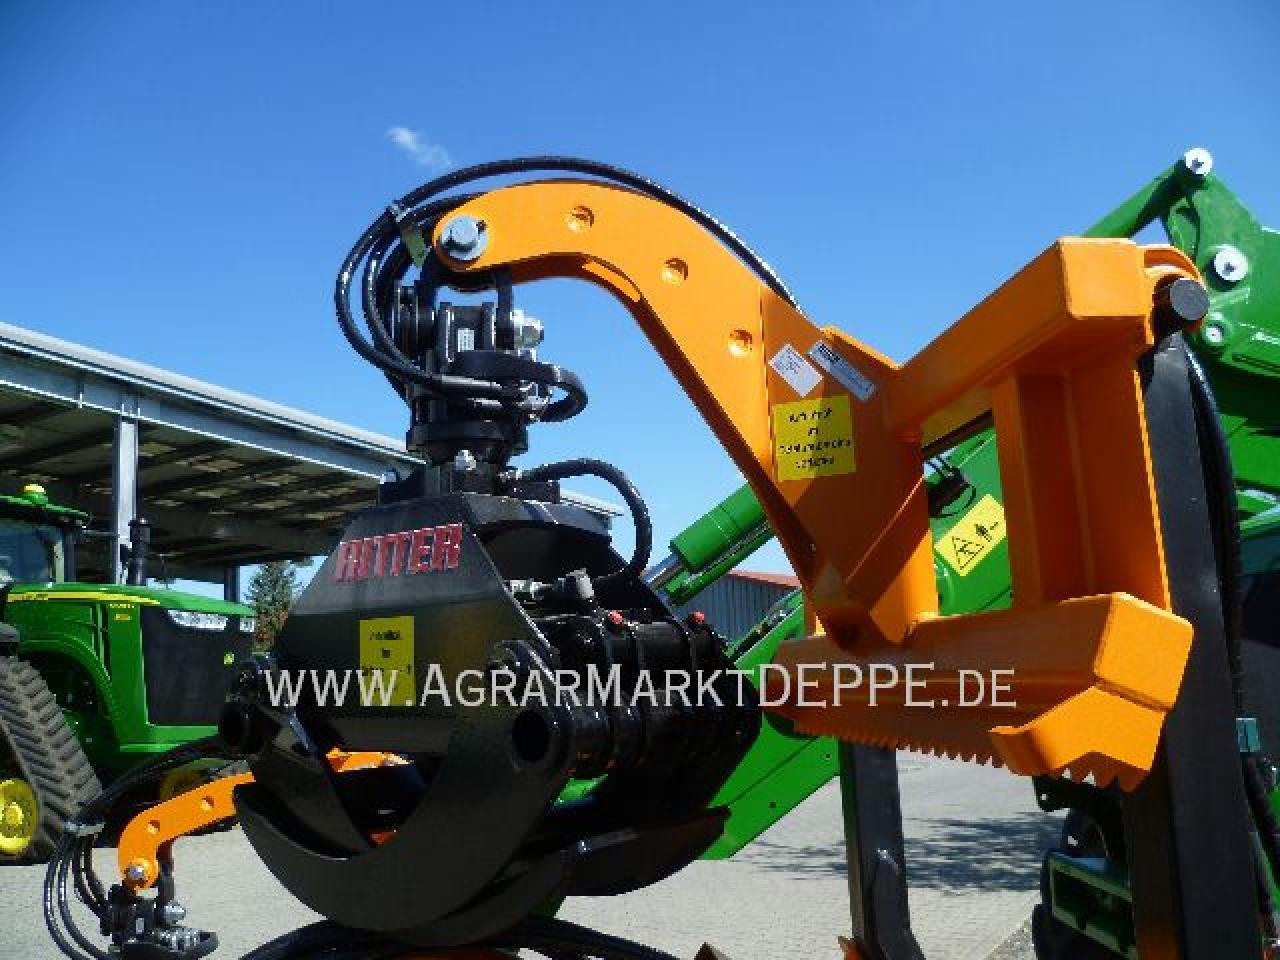 Ritter FGL3/1100